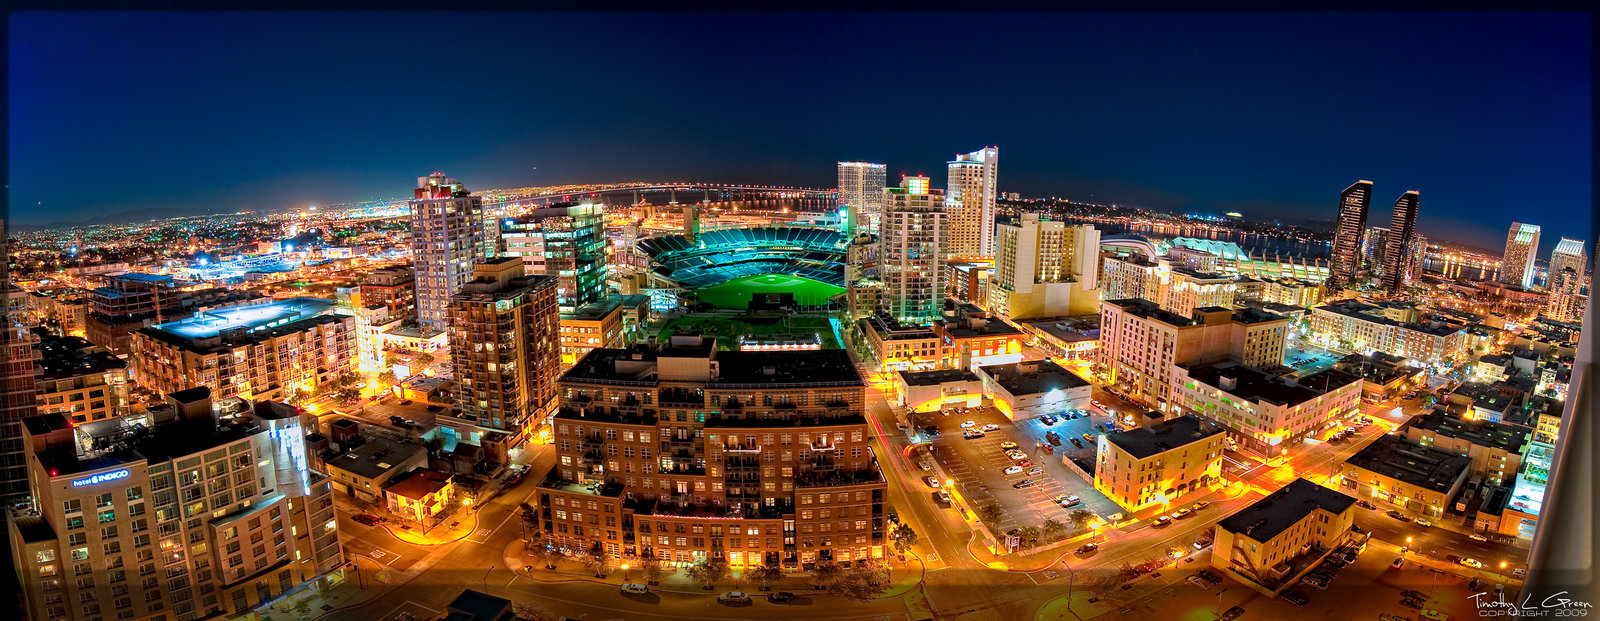 San Diego Skyline Petco Park by timothylgreen 1600x621